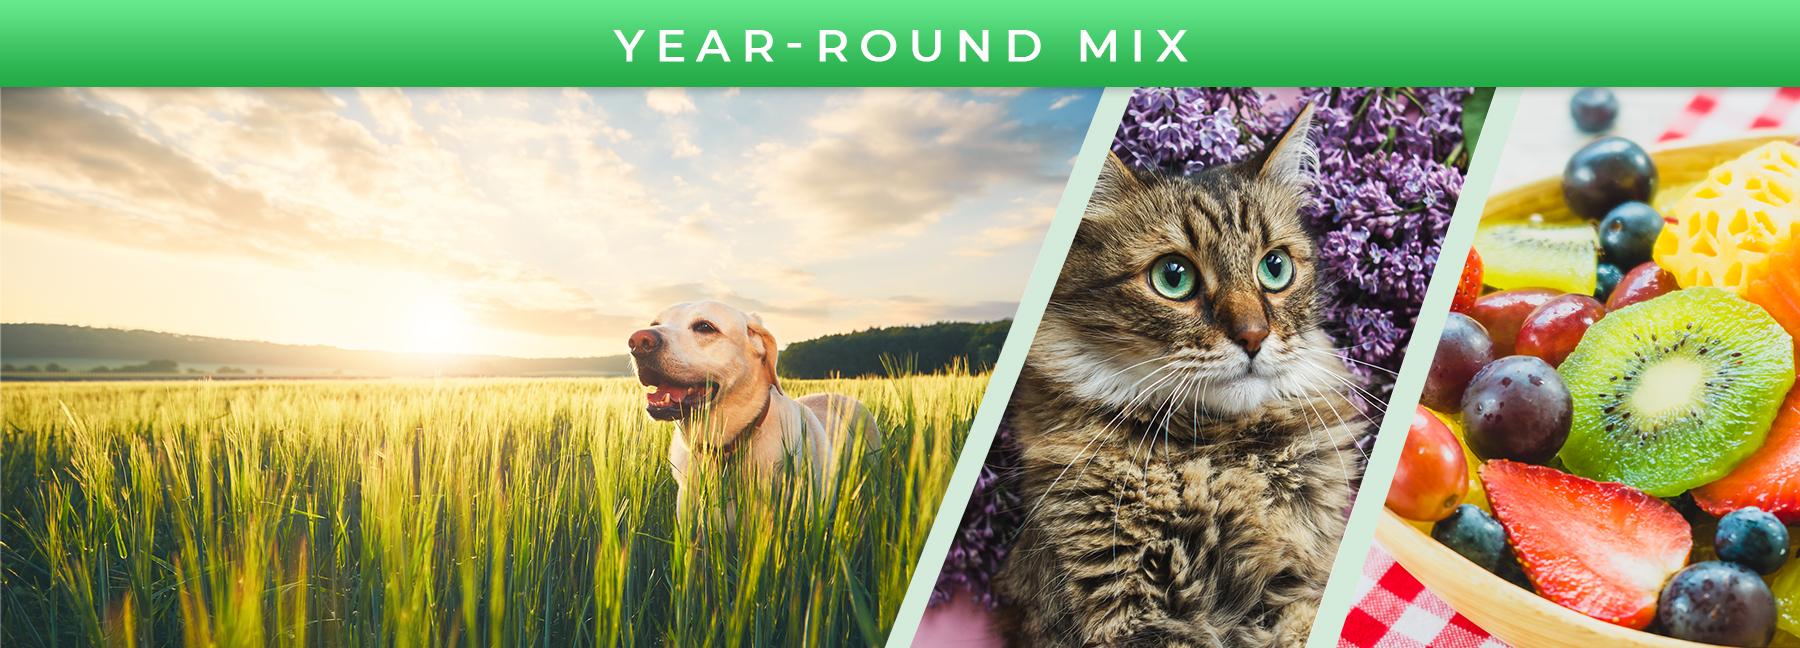 Year-Round Mix fragrance elements